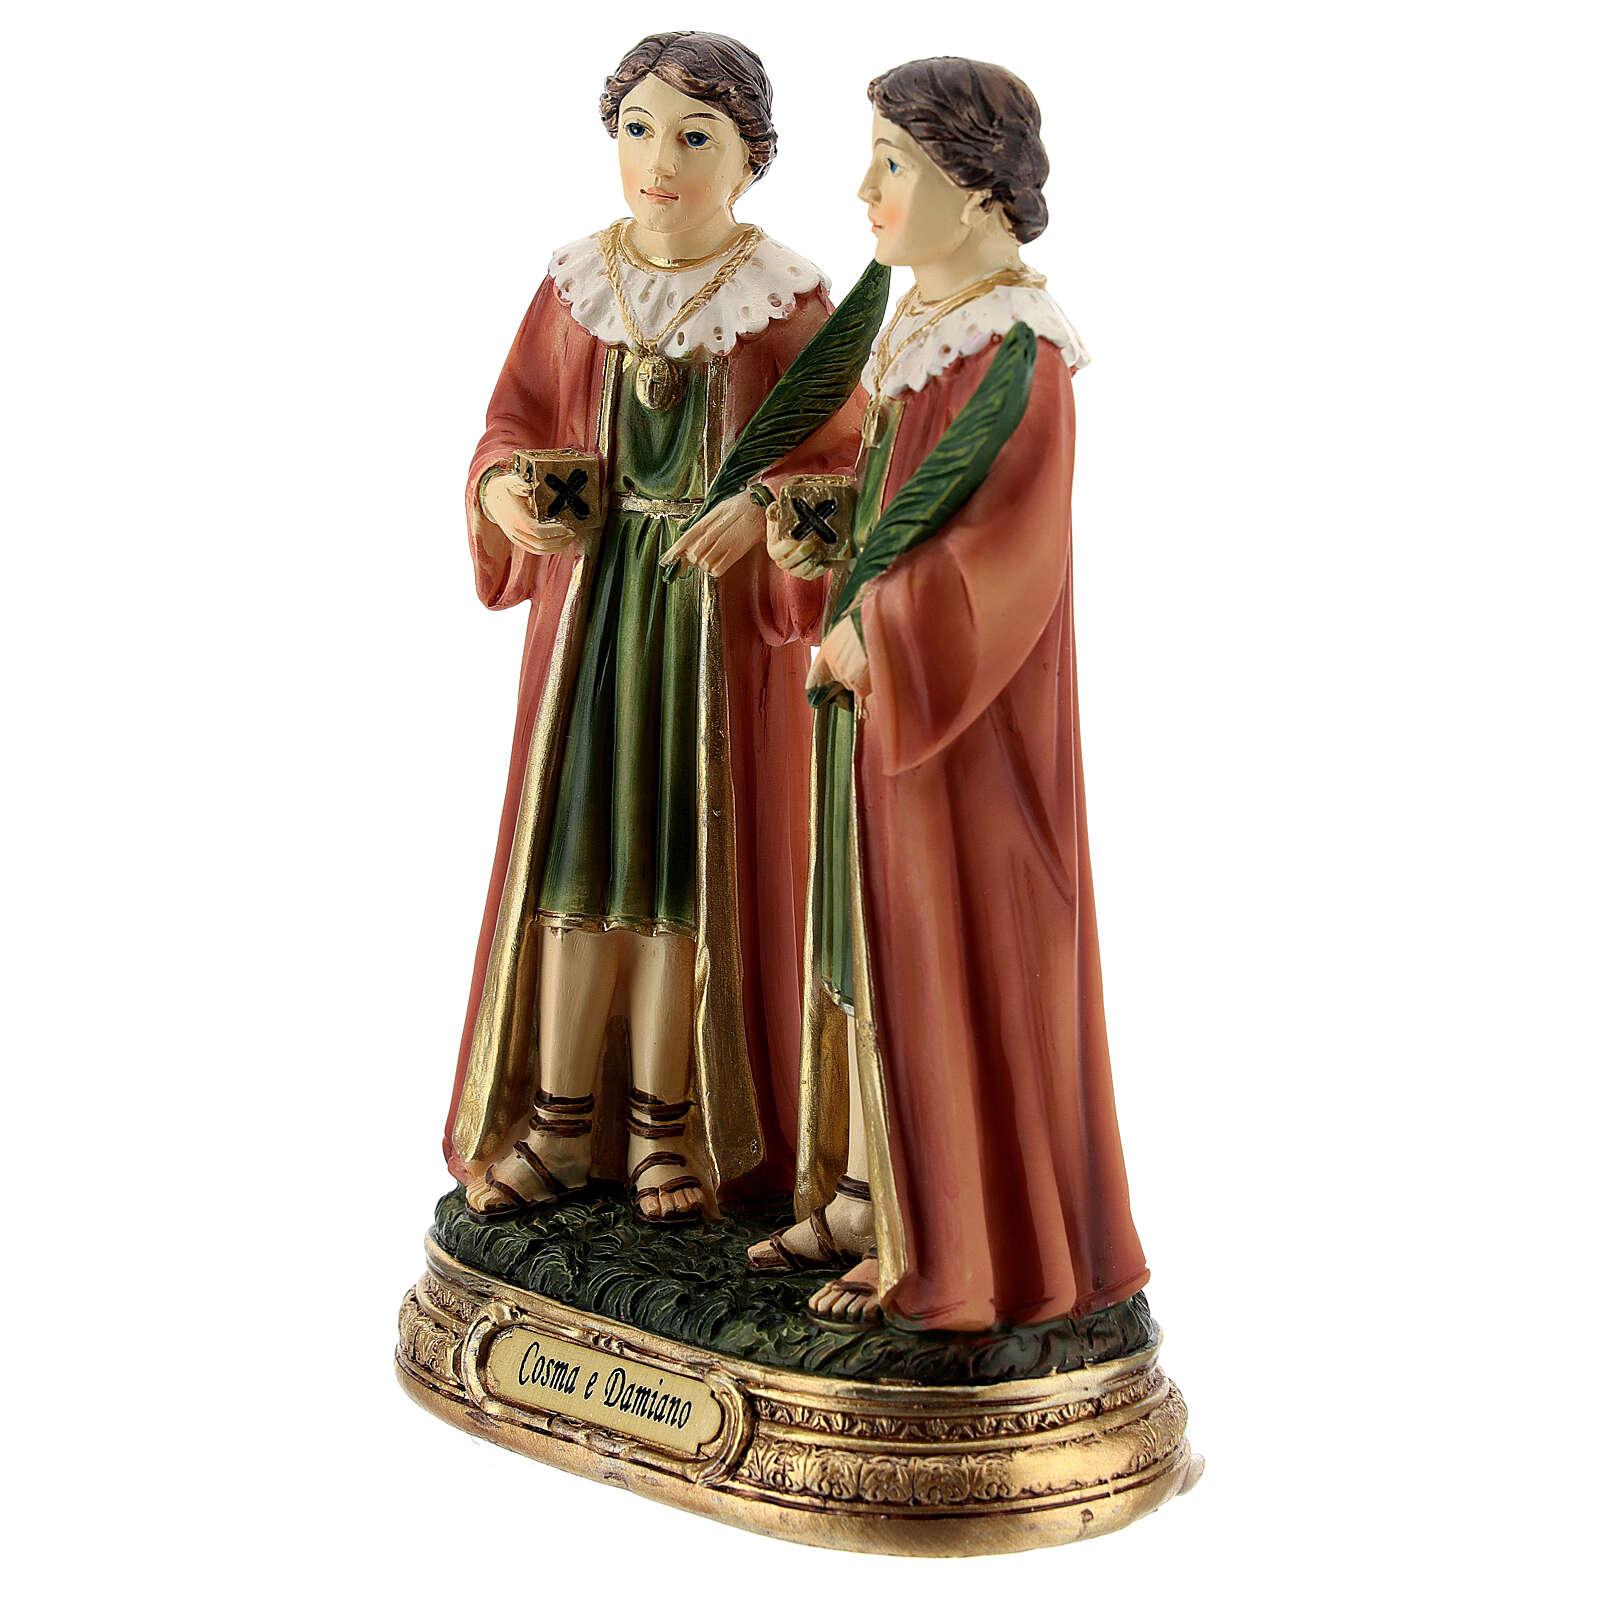 Cosma Damiano palme statua resina 12 cm 4